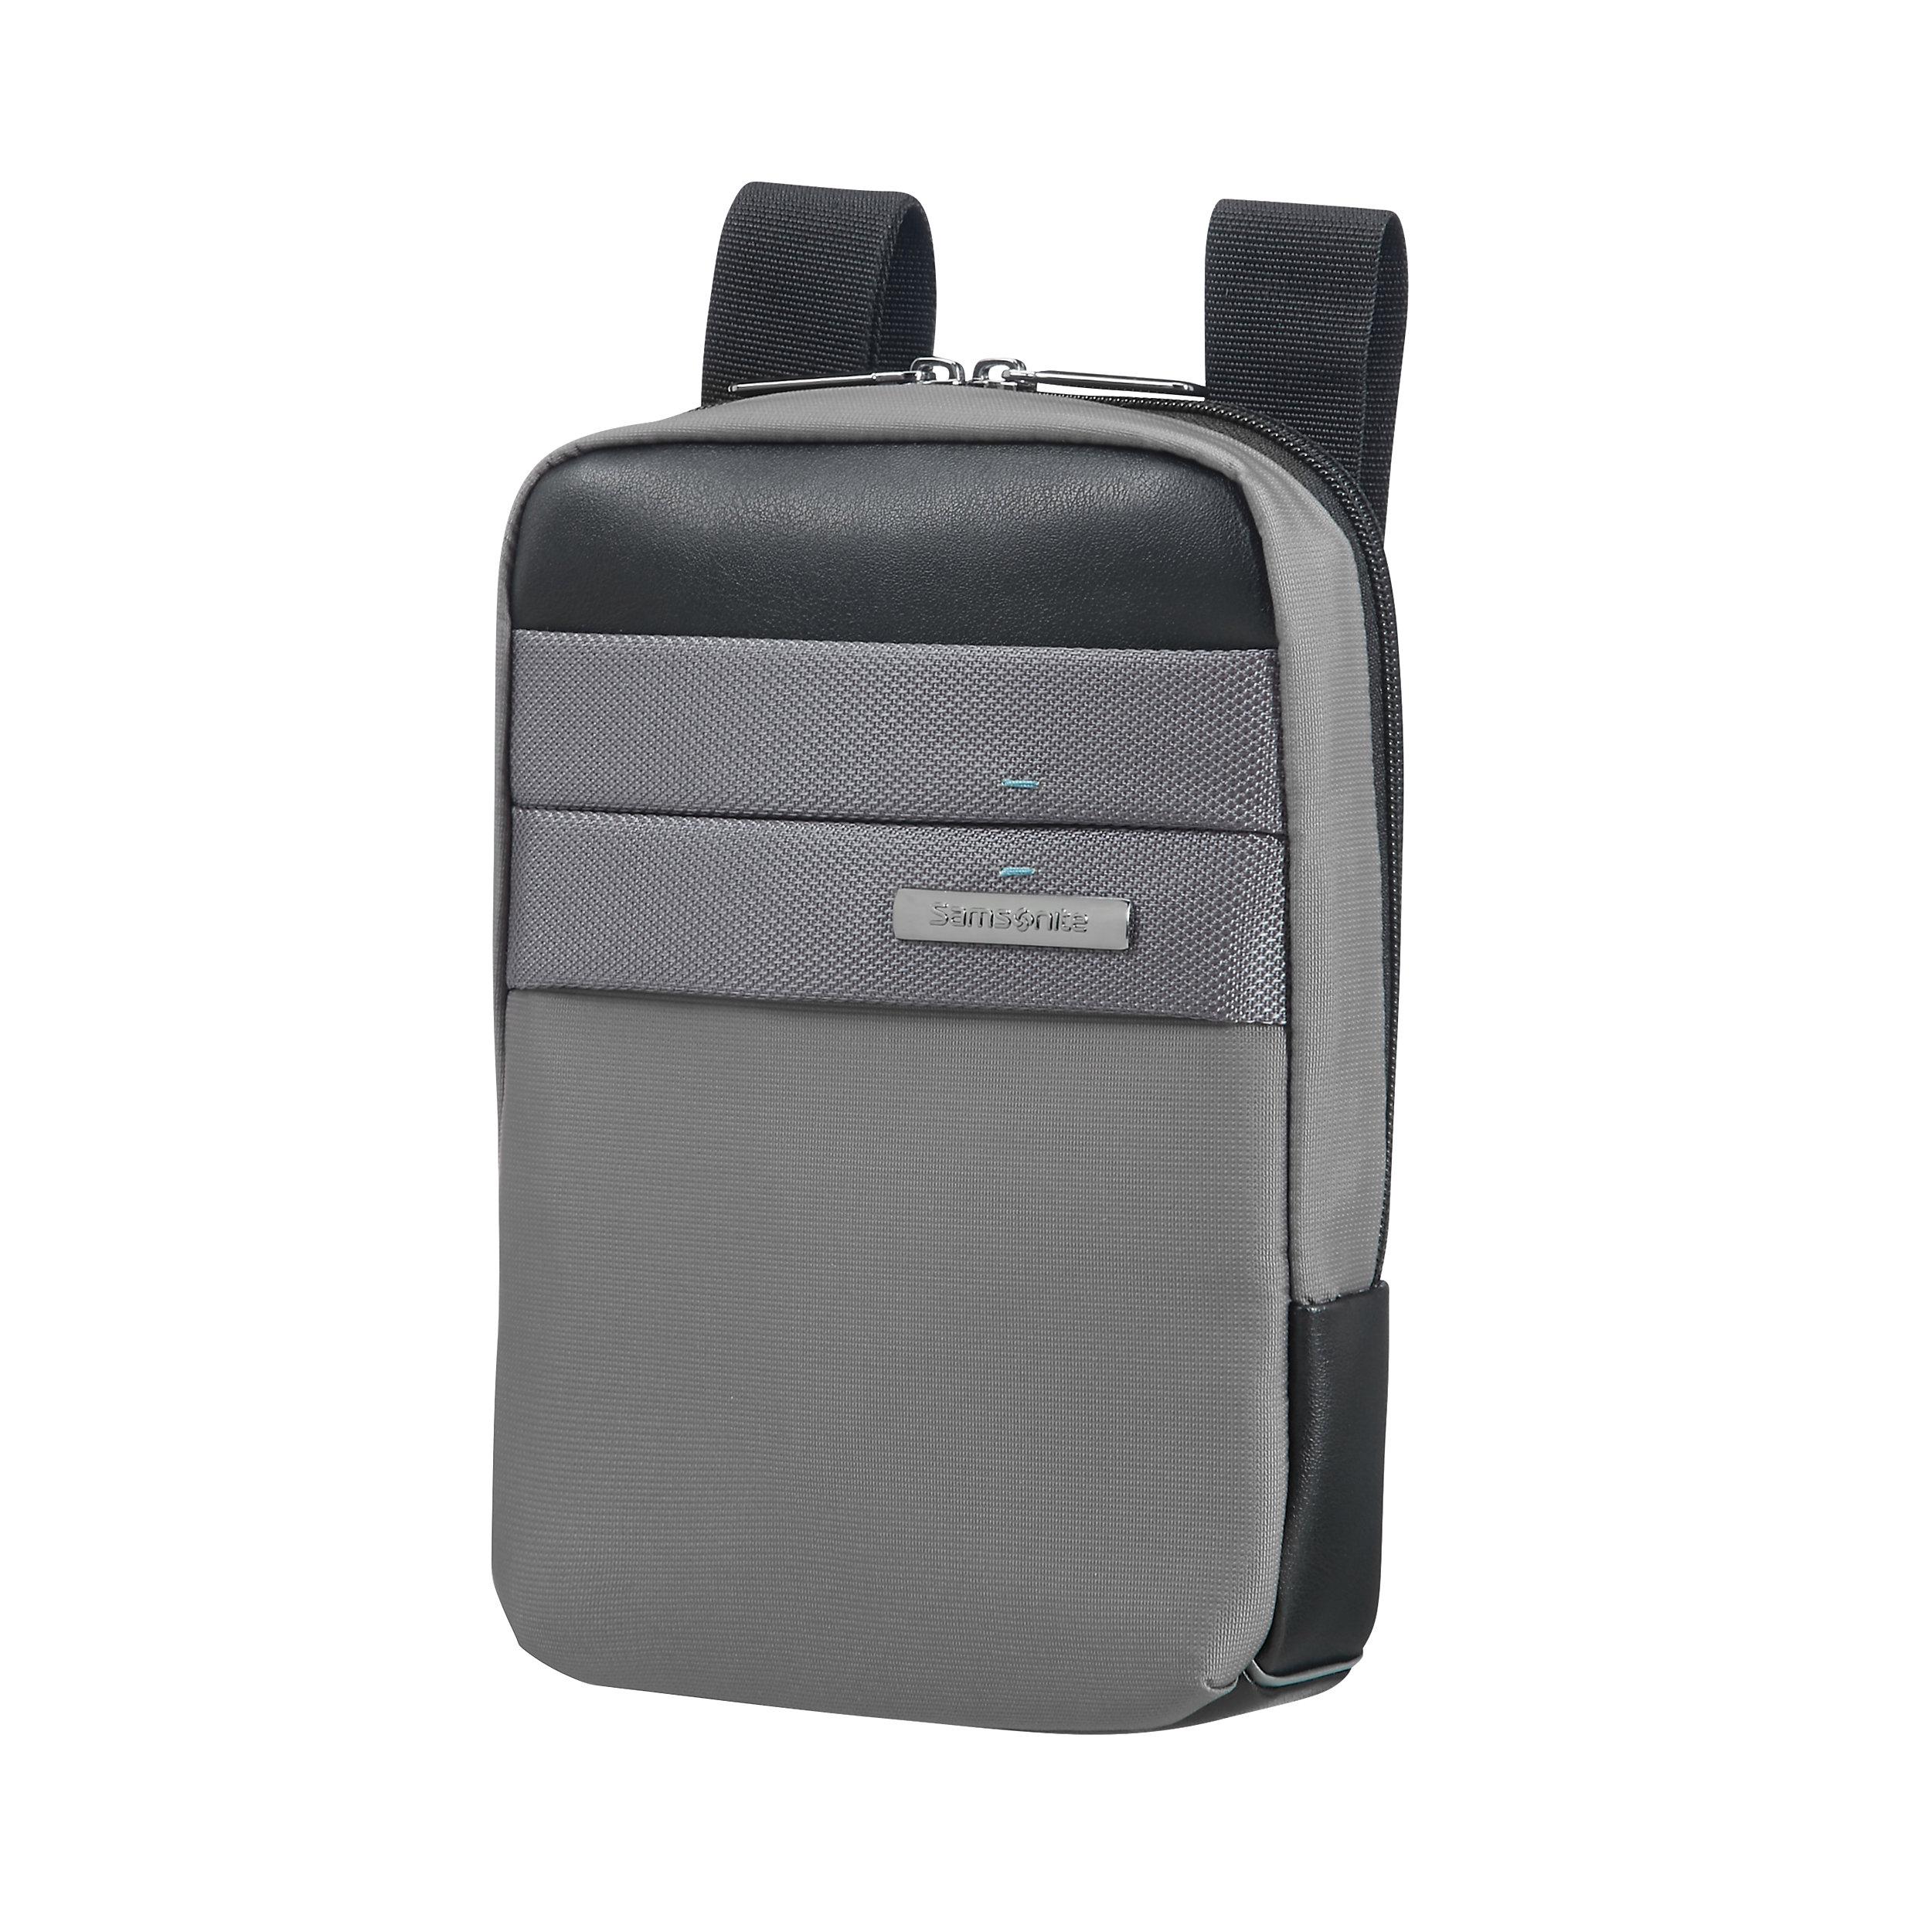 "Crossover Bag S 7,9"" Spectrolite 2.0 2 Liter"